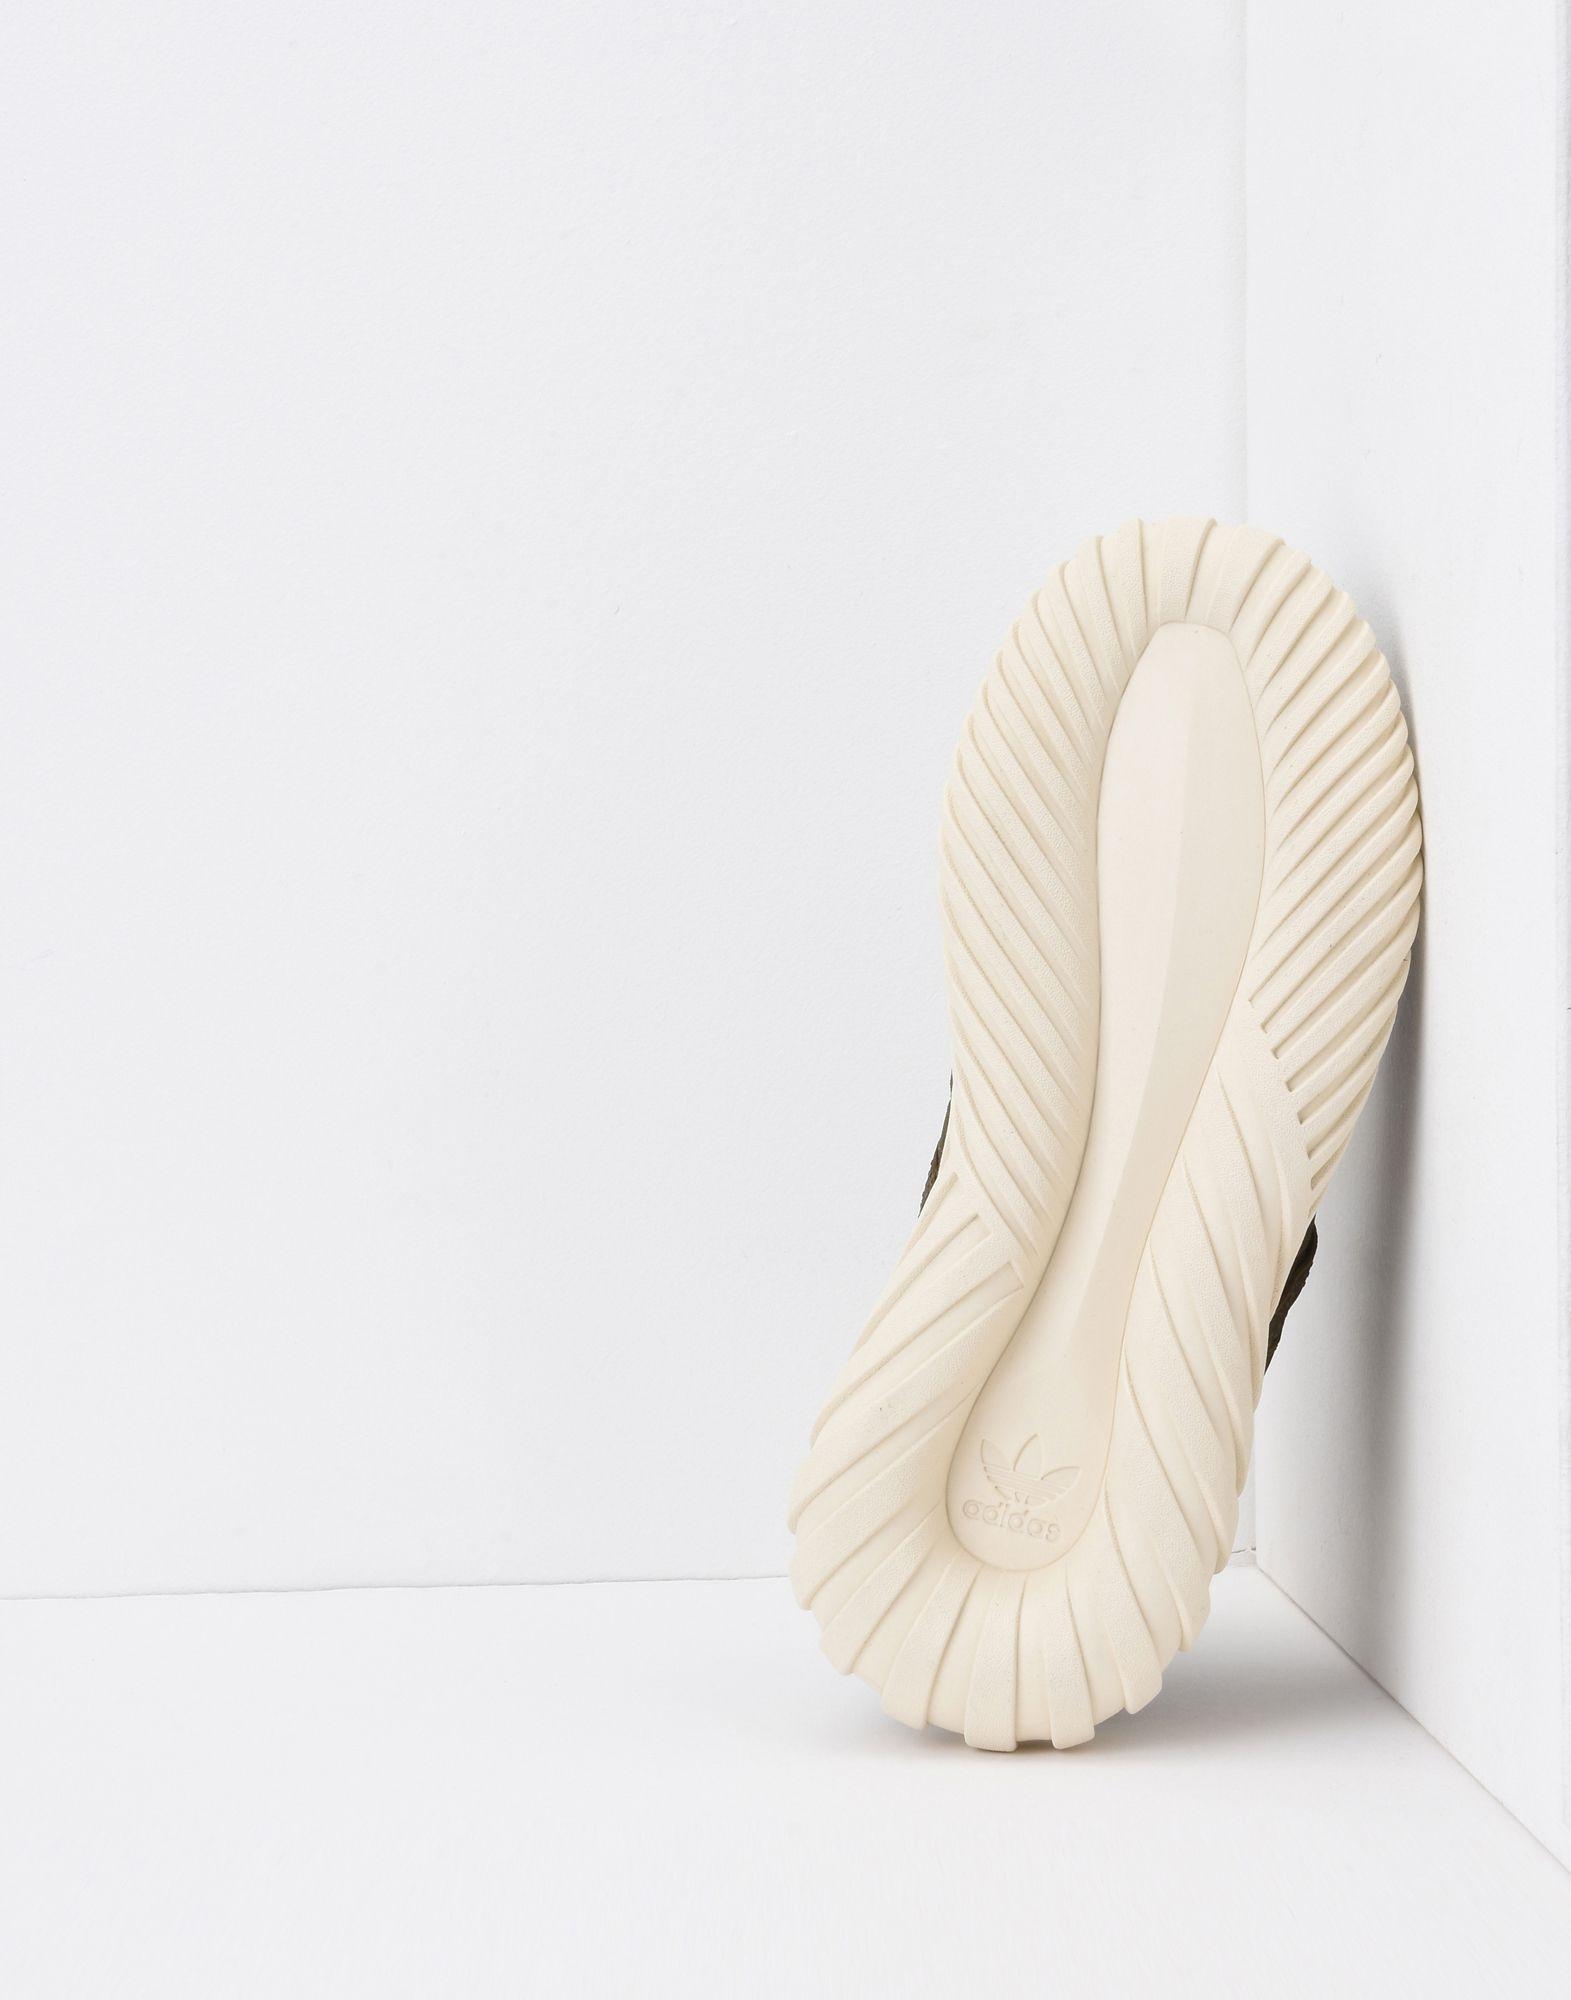 Scarpe da Ginnastica Adidas Donna Originals Tubular Dawn W - Donna Adidas - 11369245DB 21409e